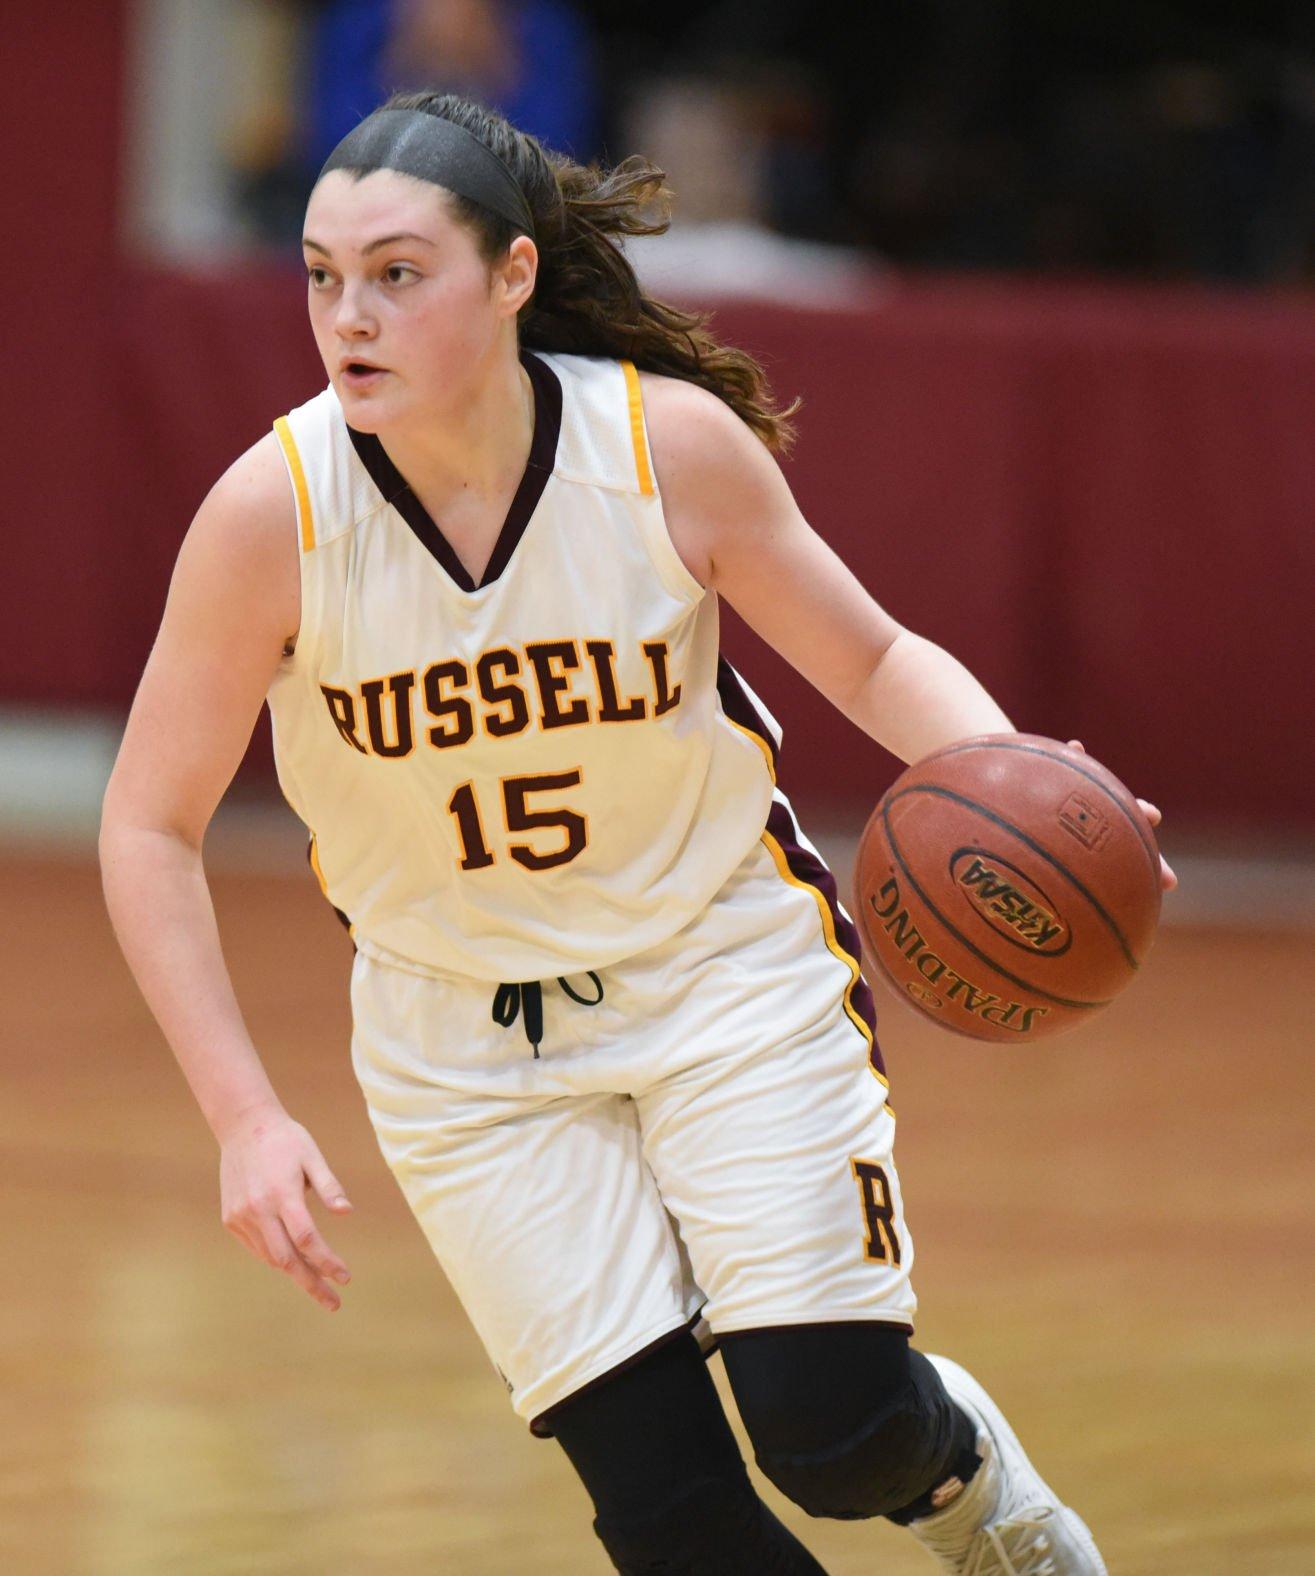 West Carter at Russell girls basketball